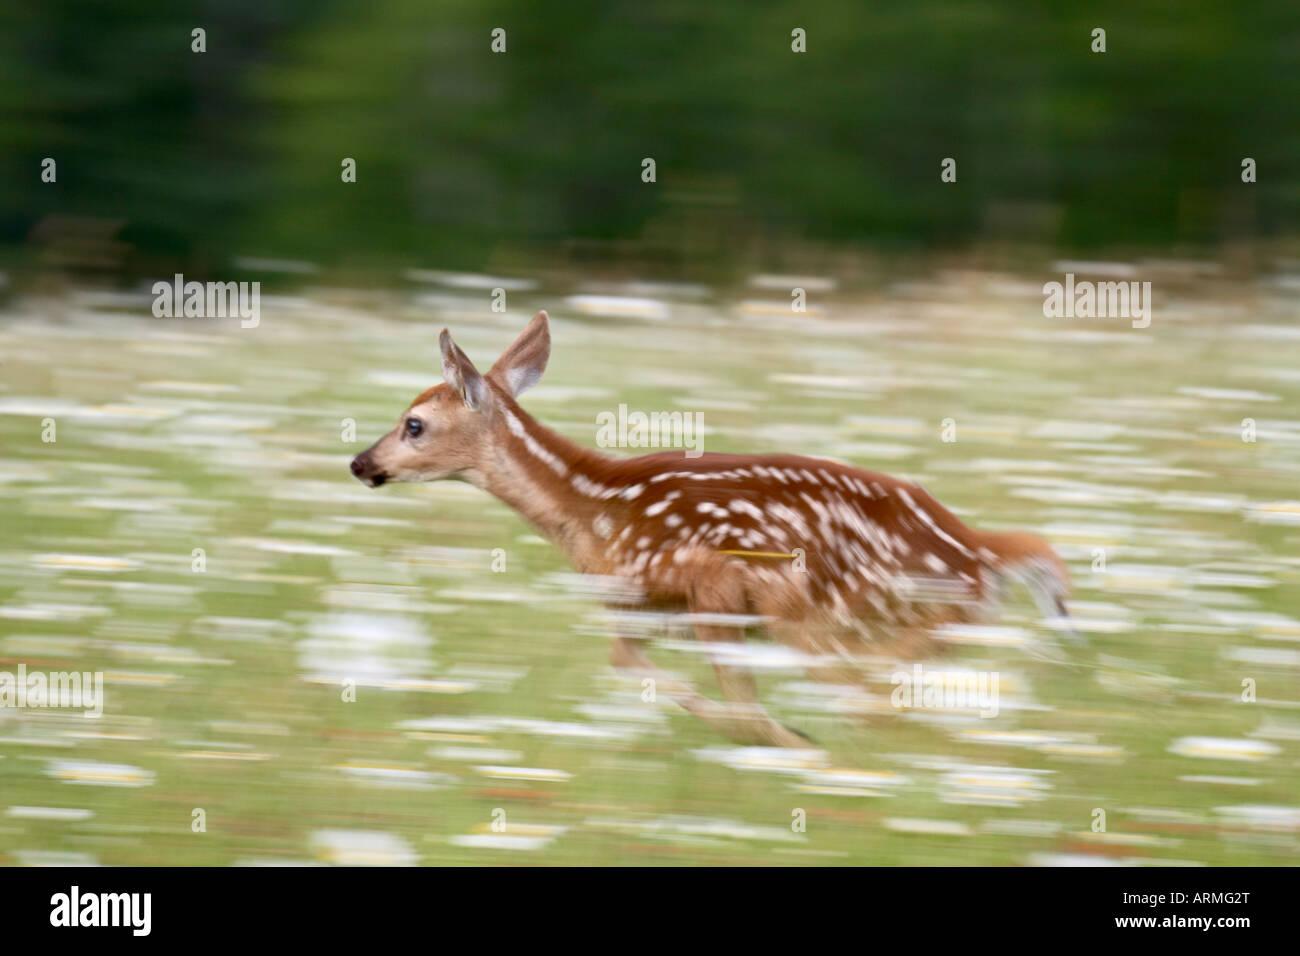 Captive whitetail deer fawn (Odocoileus virginianus) running through a field of wildflowers, Sandstone, Minnesota, - Stock Image